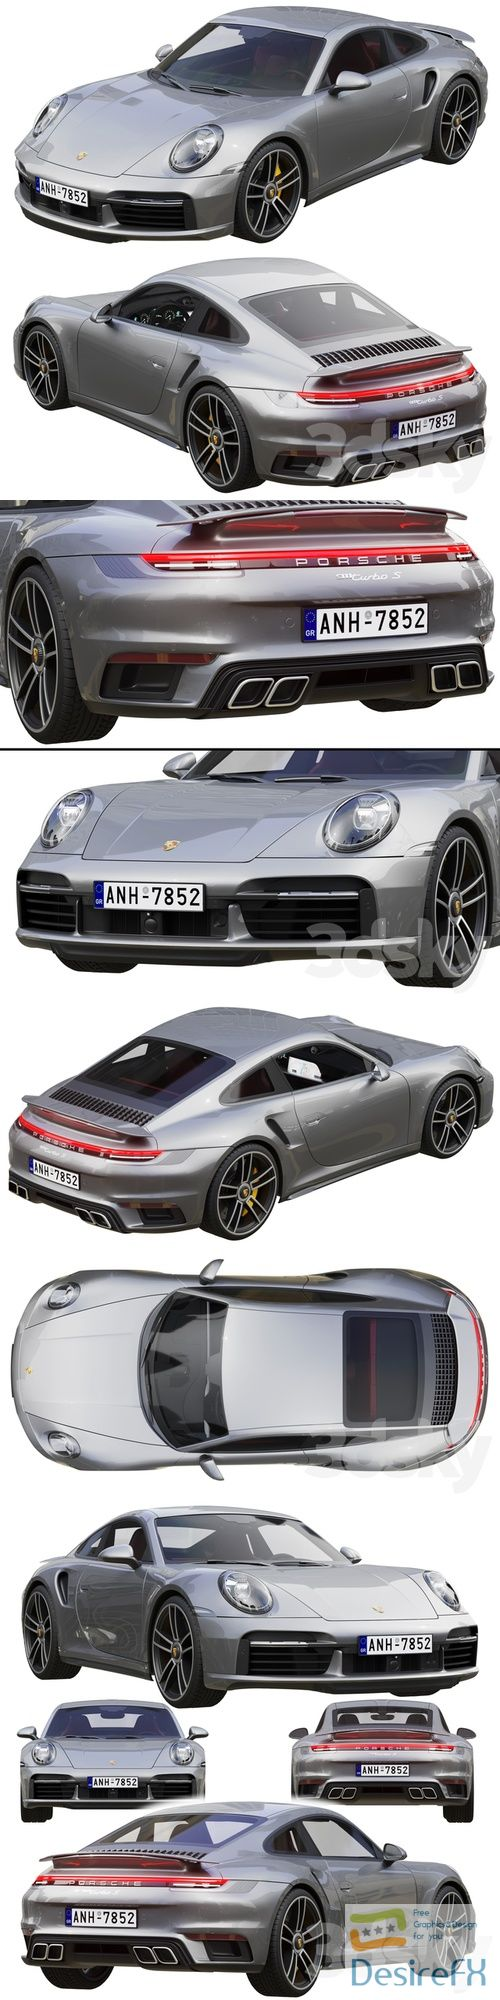 Porsche 911 Turbo S 2021 3D Model